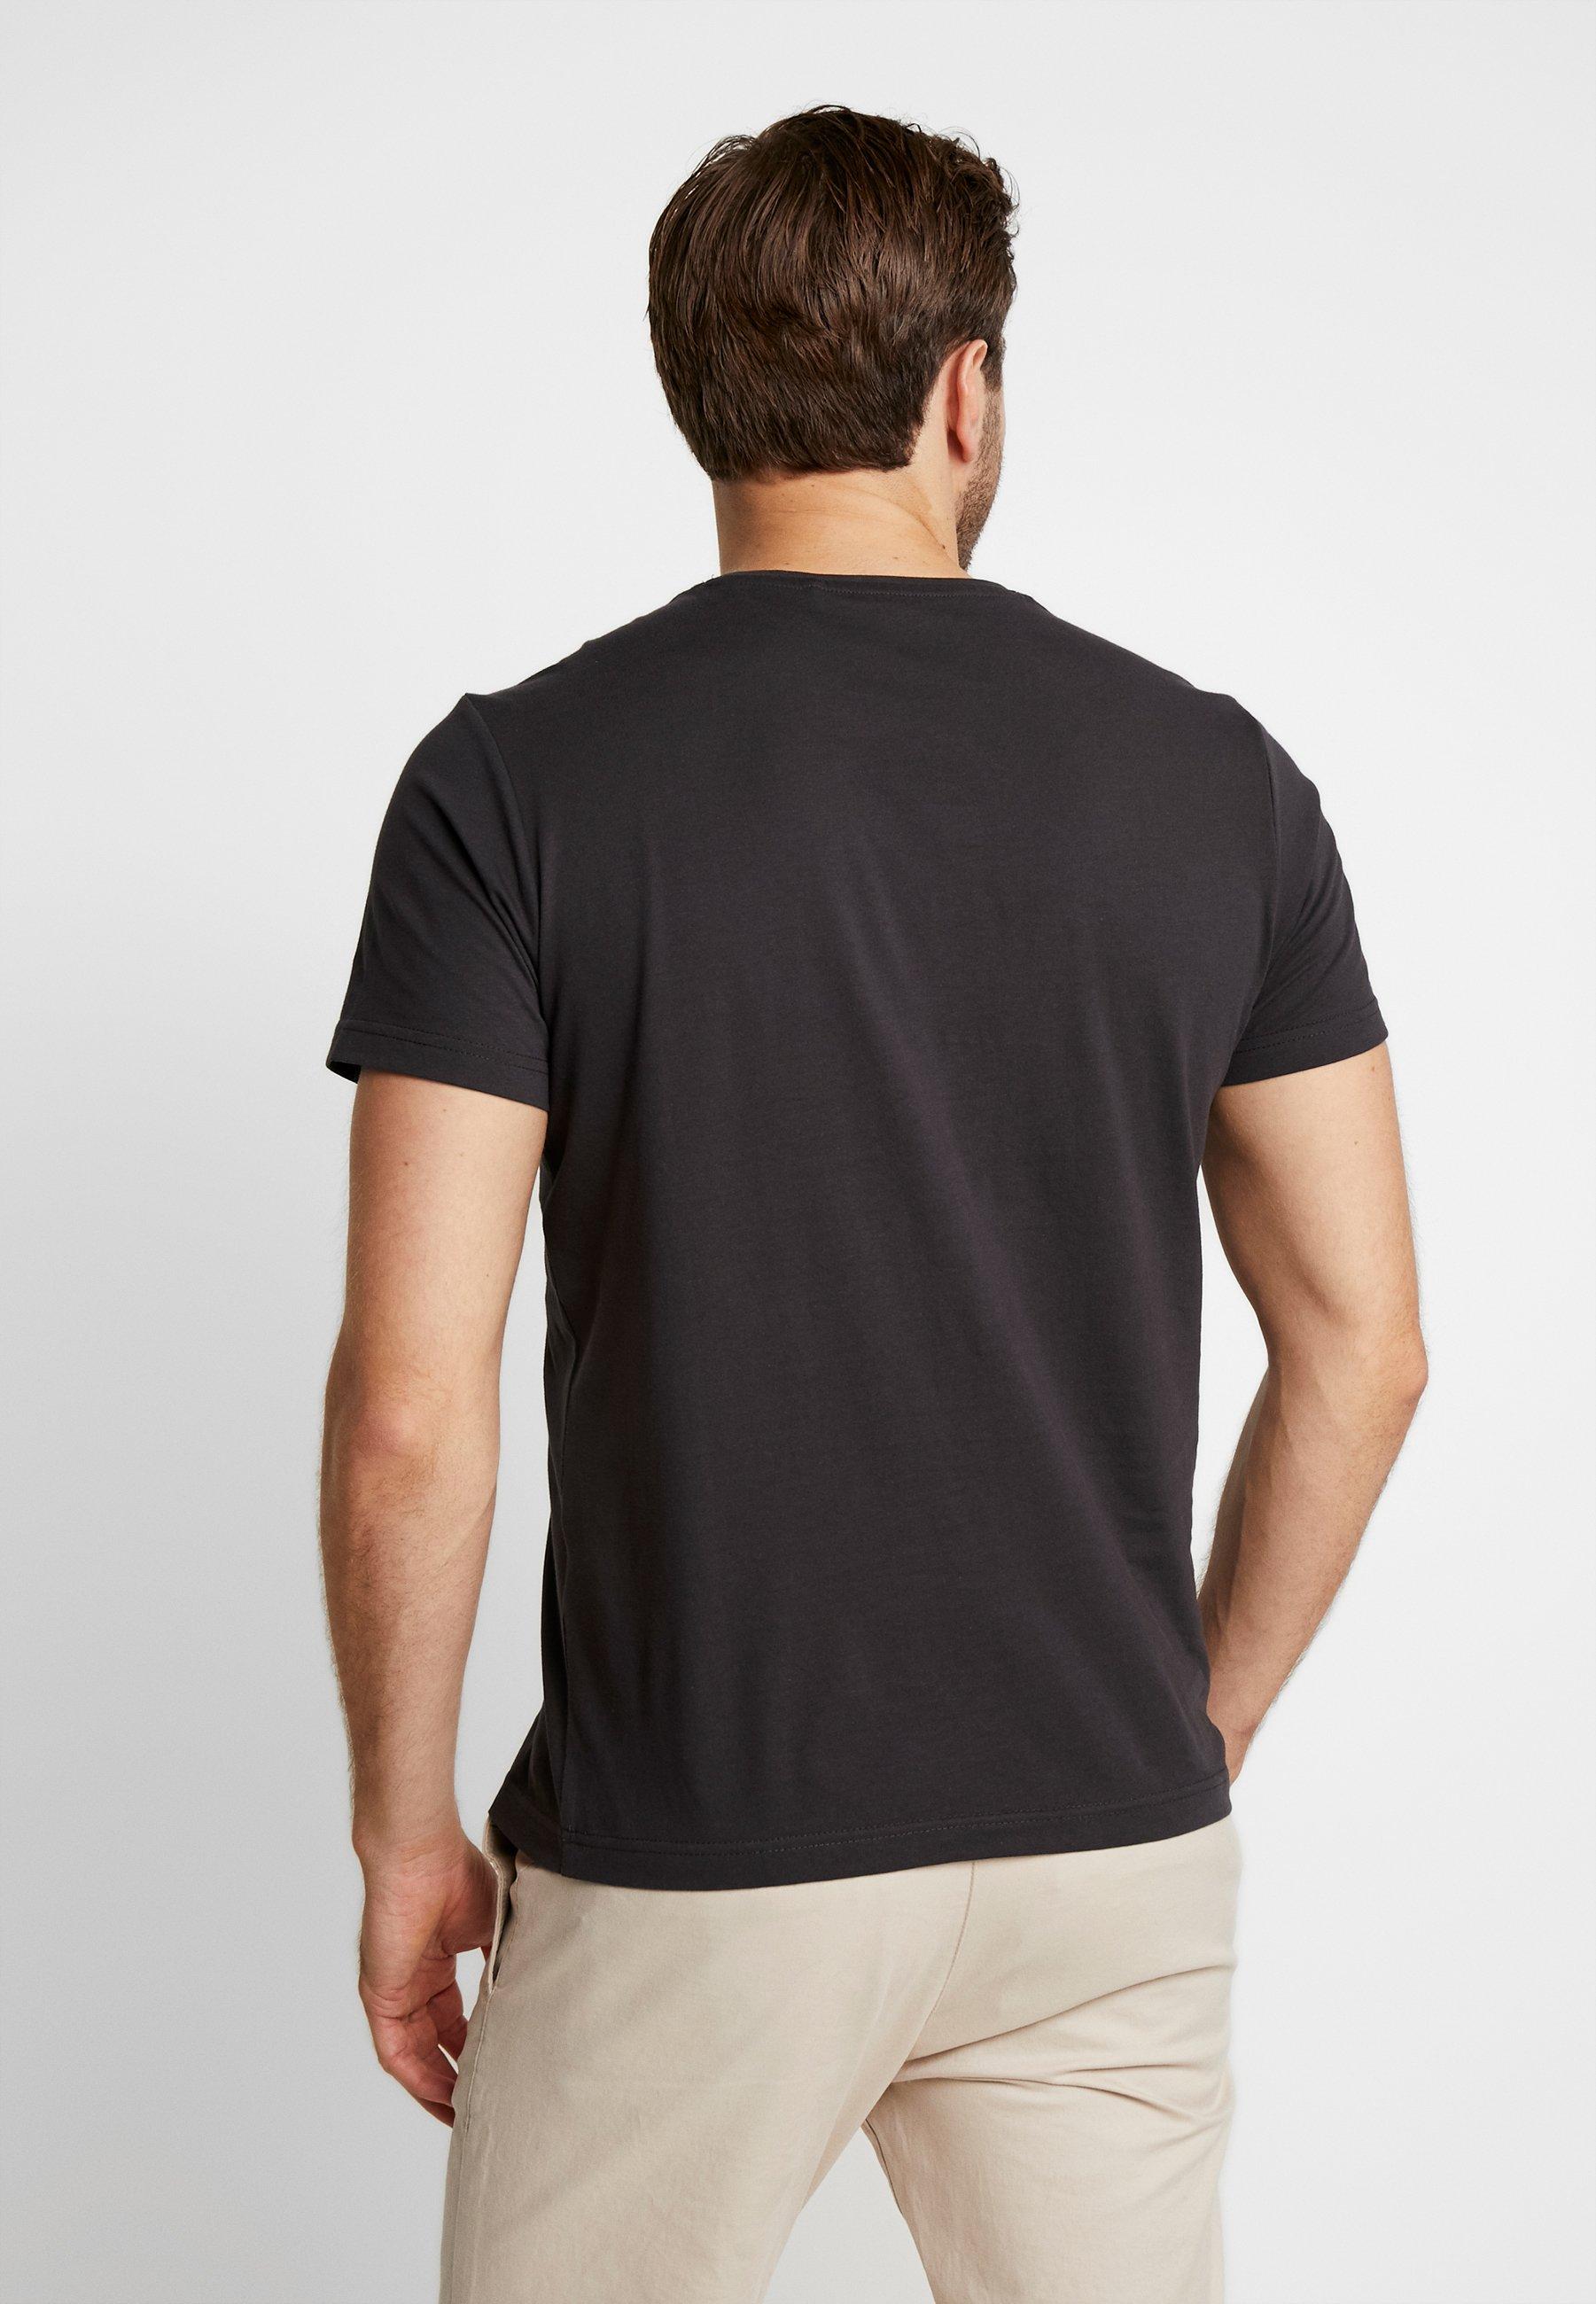 shirt black Kurzarm oliver S Grey PackT Imprimé 2 HD2eE9YIW